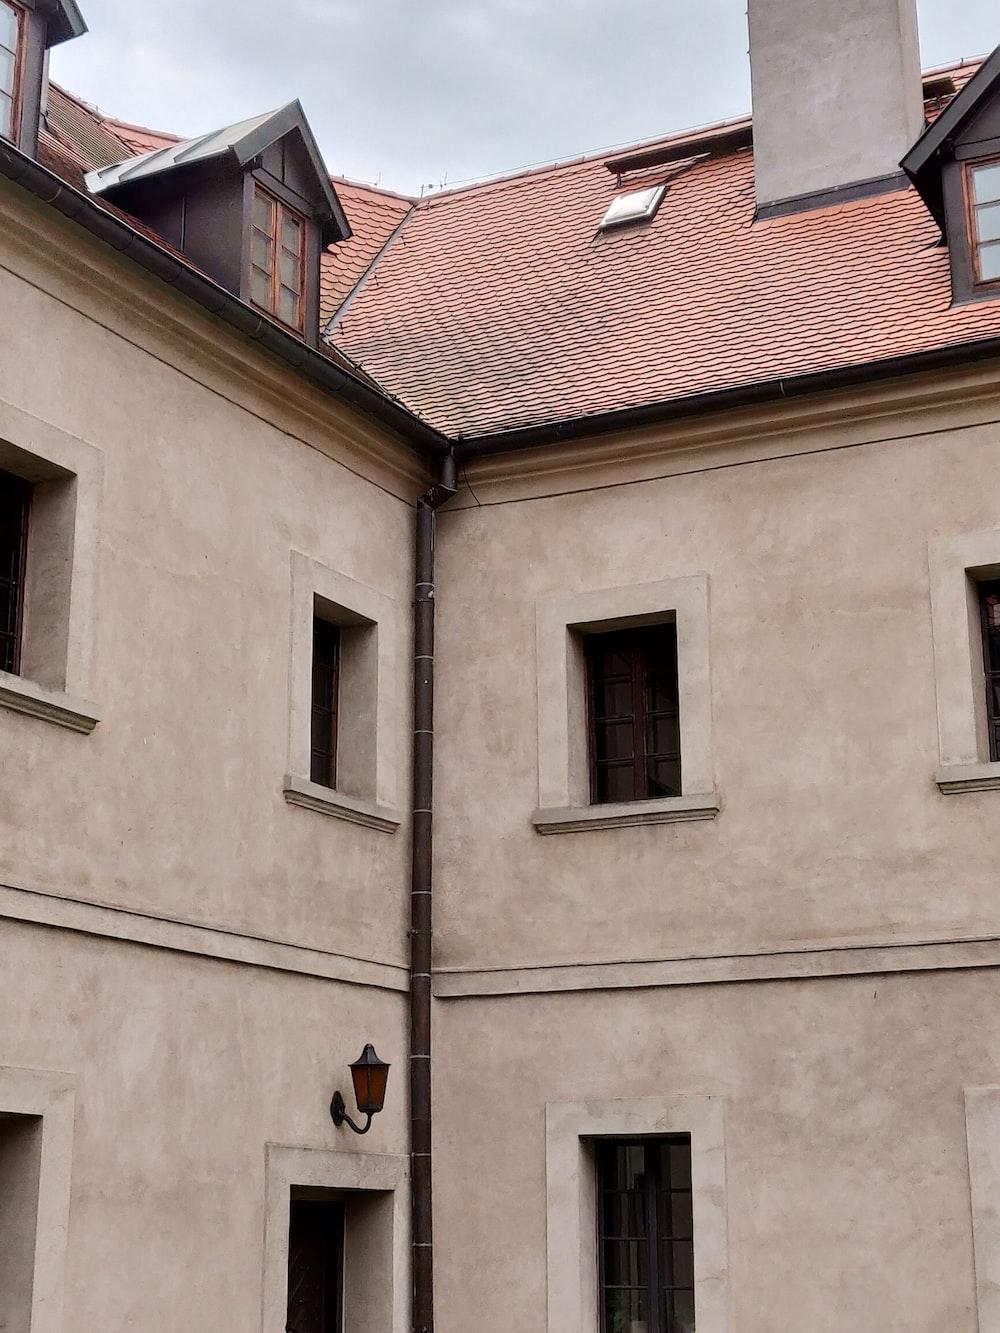 beige concrete 2-storey building during daytime